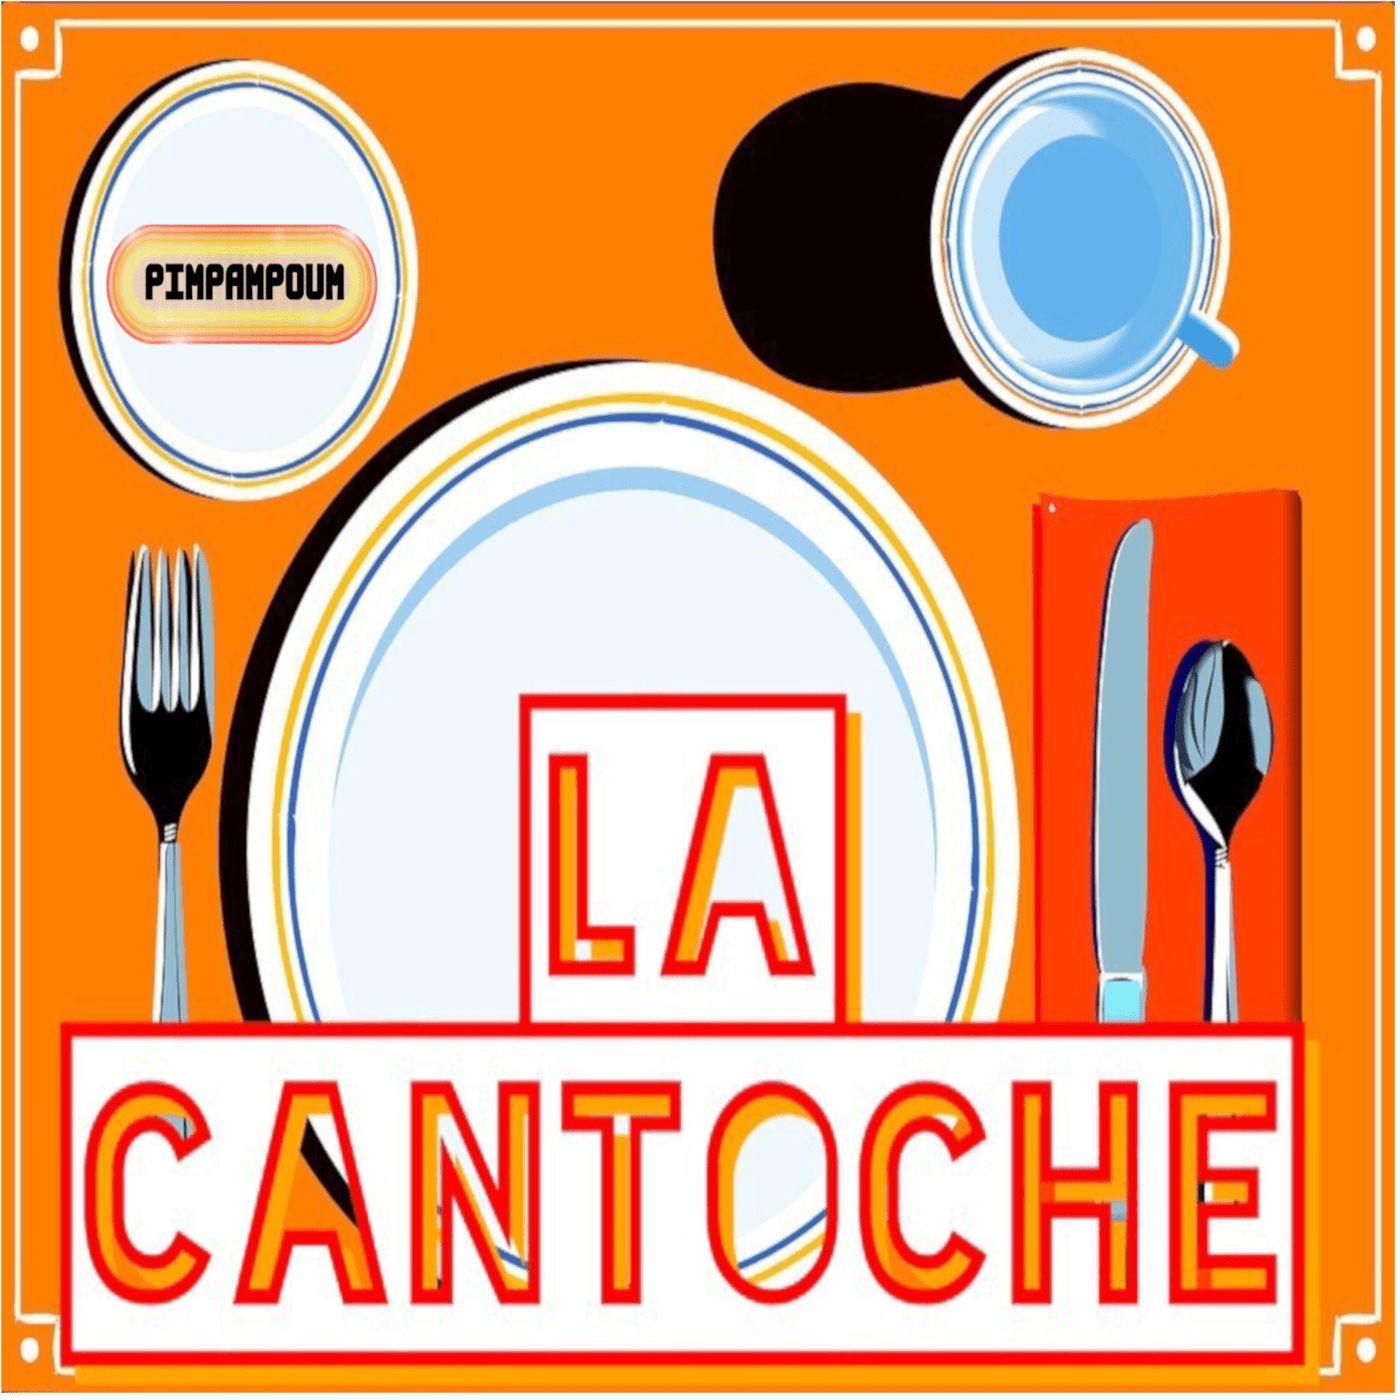 La Cantoche #8 - Mardi Gras: la fête à Neuneu ?